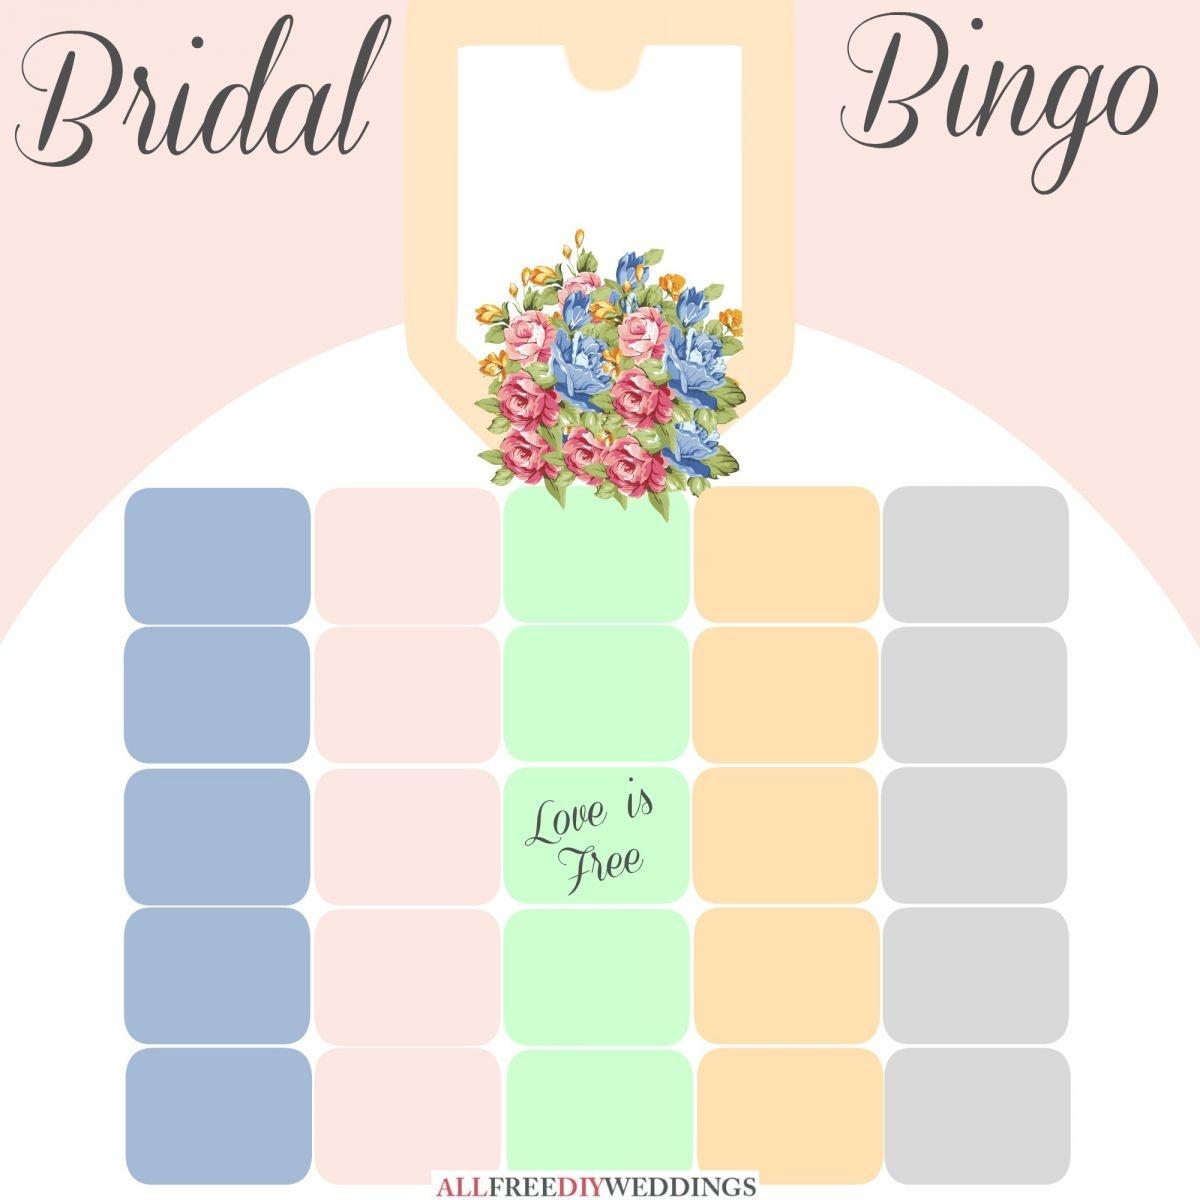 New Bridal Bingo: Free Bridal Shower Games   Allfreediyweddings - Free Printable Bridal Shower Blank Bingo Games